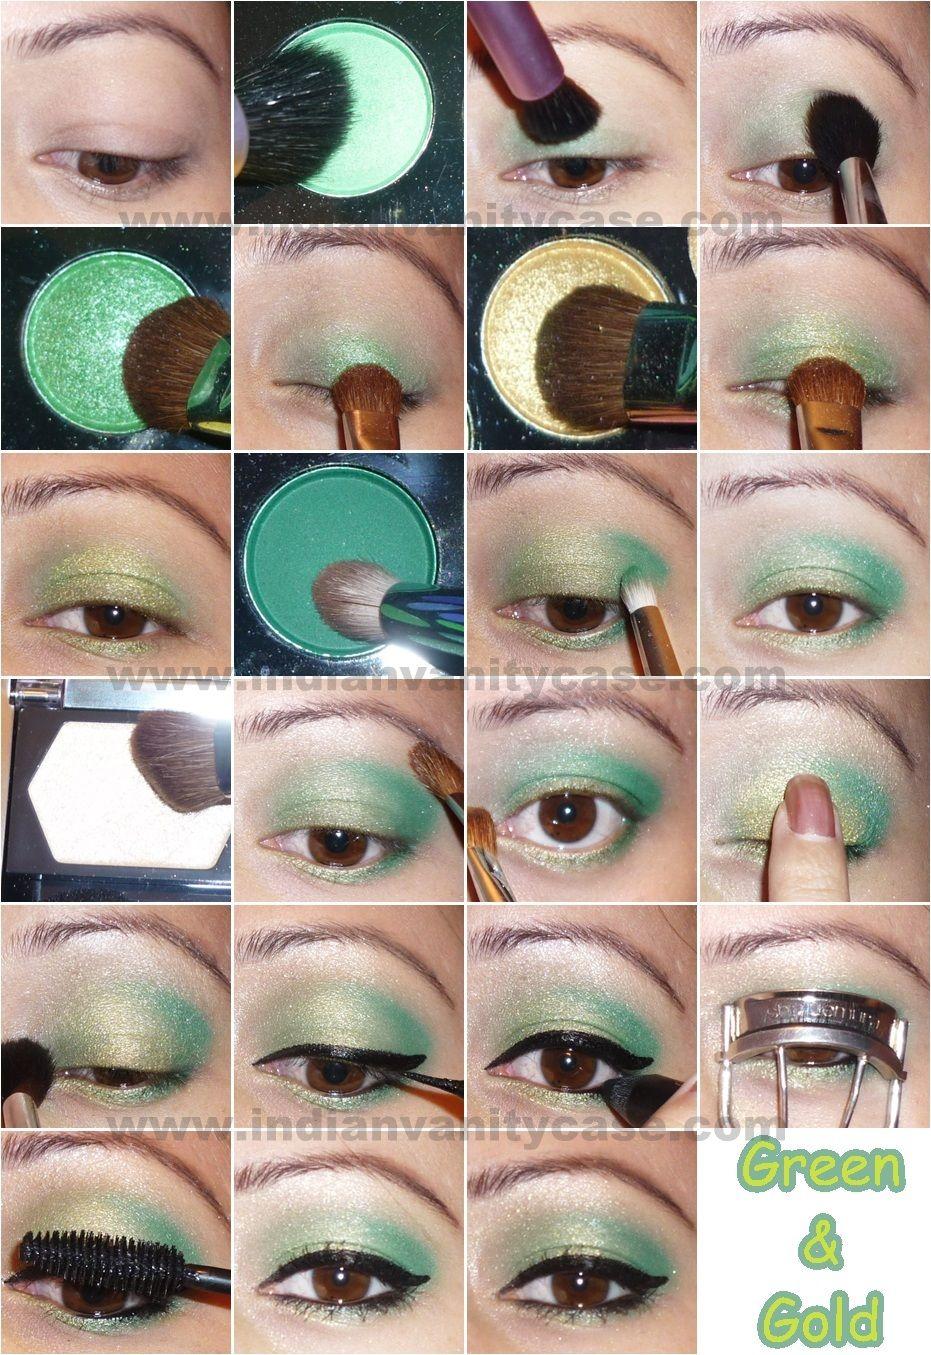 Indian vanity case diwali eye makeup tutorials for everyone diwali eye makeup tutorials for everyone green and gold baditri Images